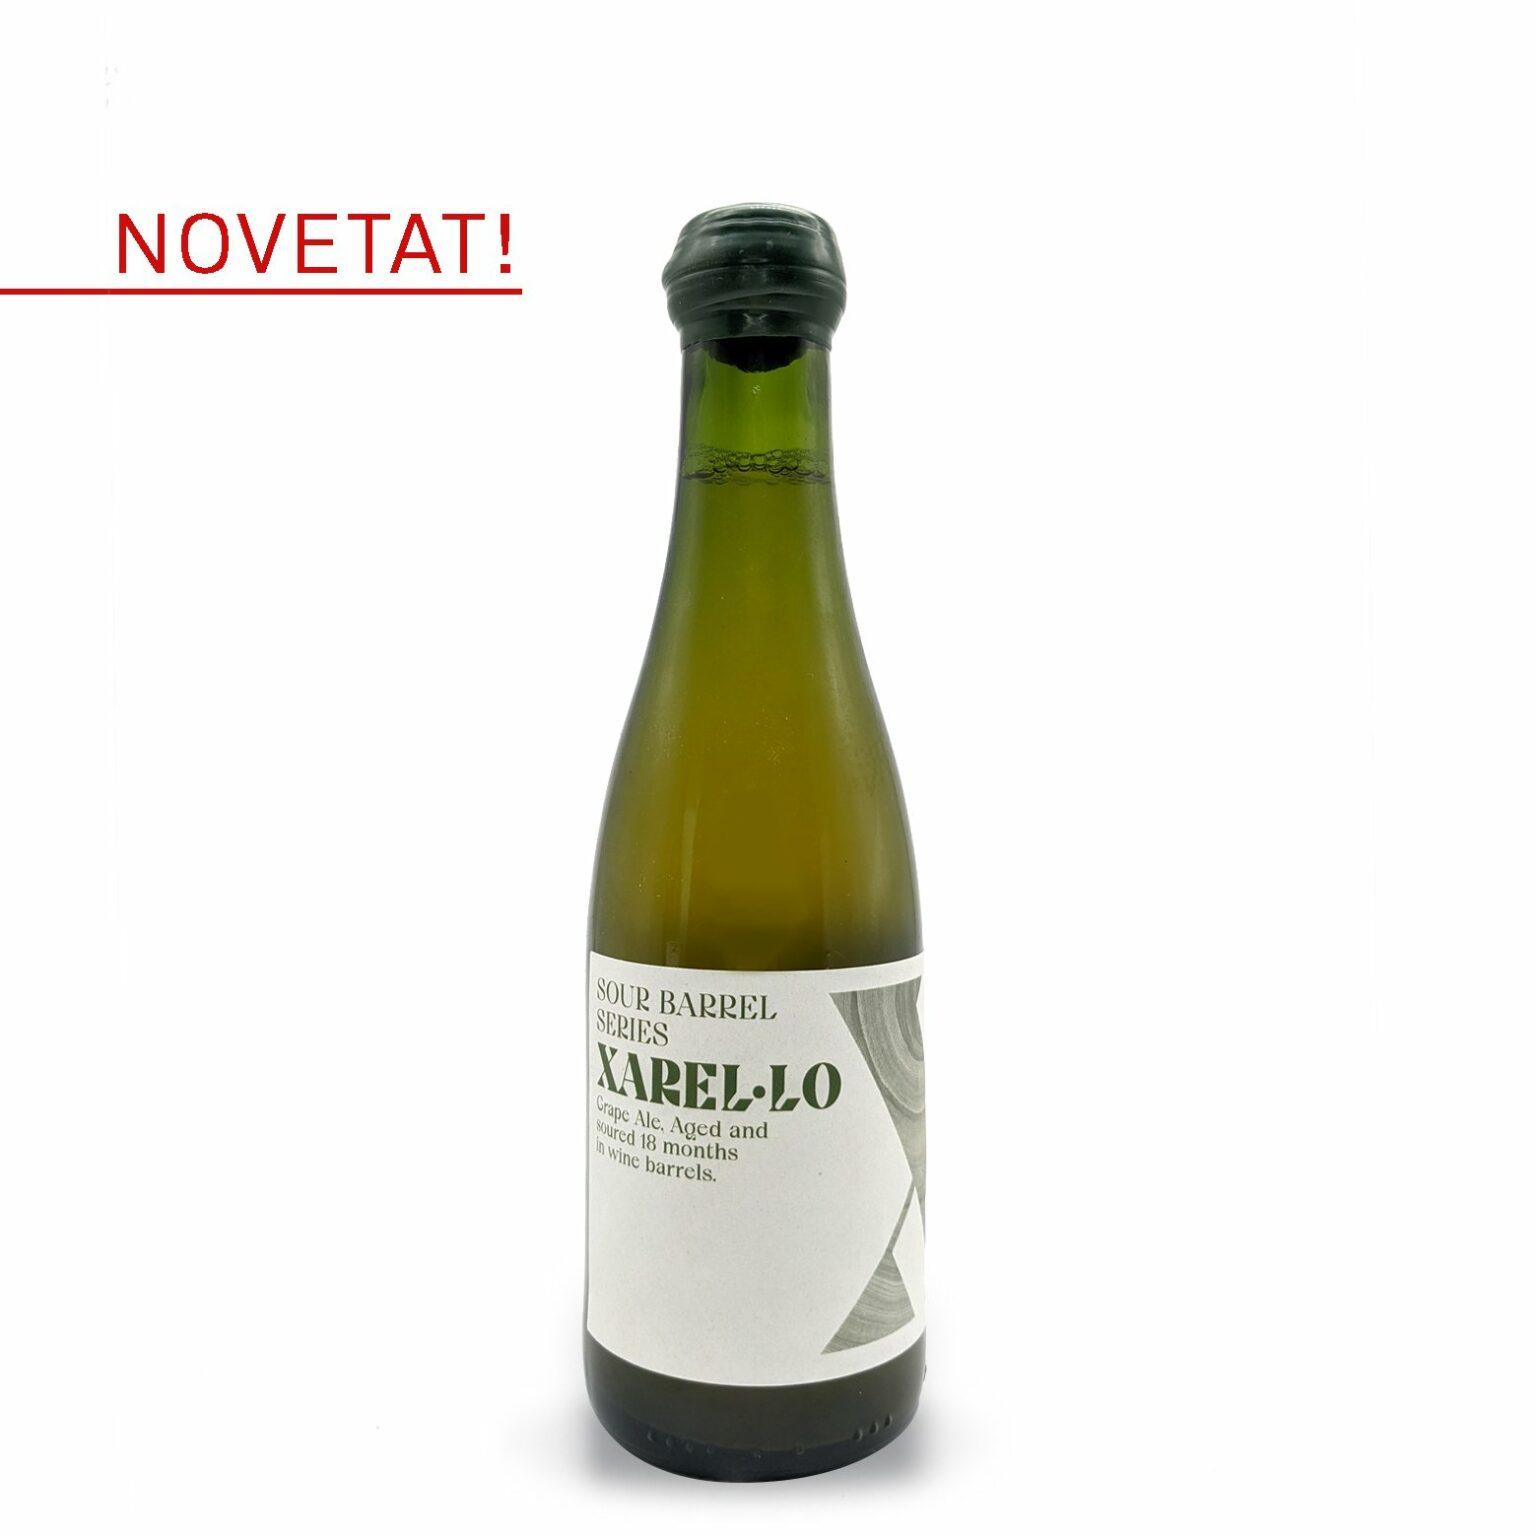 https://www.lestupenda.com/wp-content/uploads/2021/04/Cervesa-Artesana-Ecològica-Sour-Barrel-LEstupenda-Xarello-1536x1536.jpg